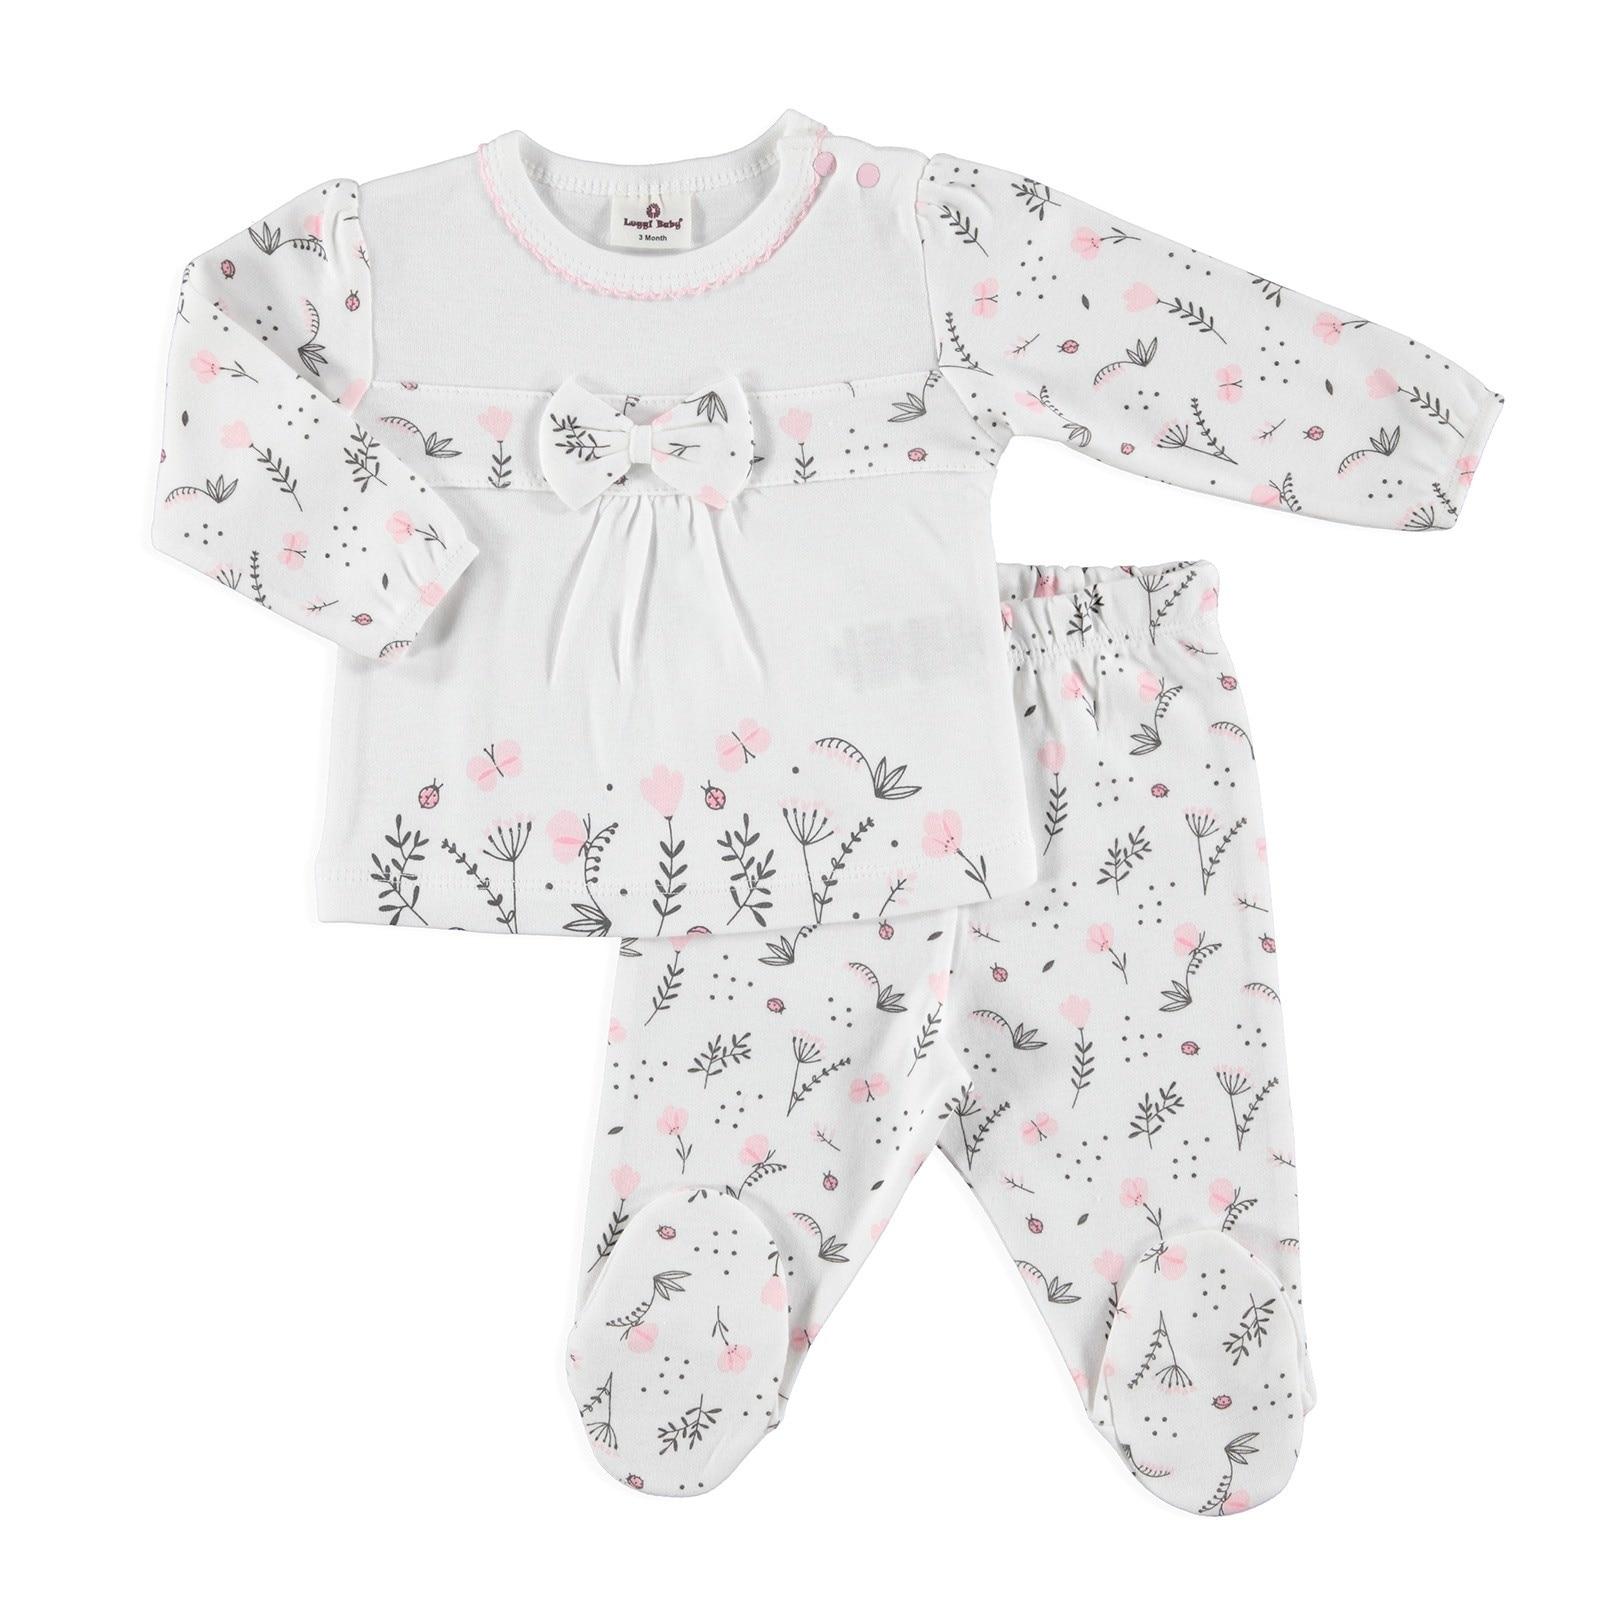 Ebebek Luggi Winter Baby Girl Organic Flower Bowtie Footed Pyjamas Set